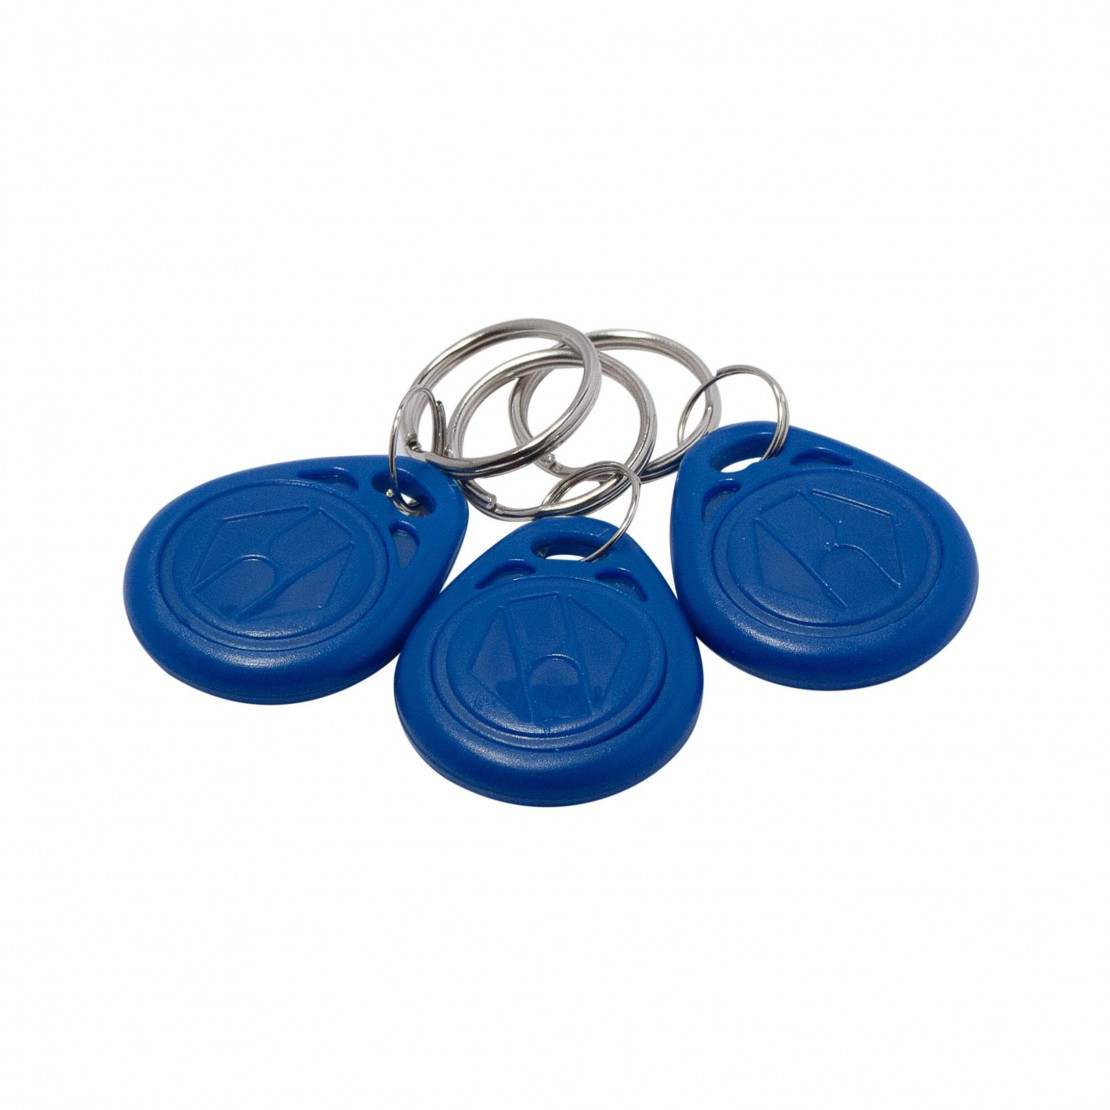 Set of 3 RFID badges